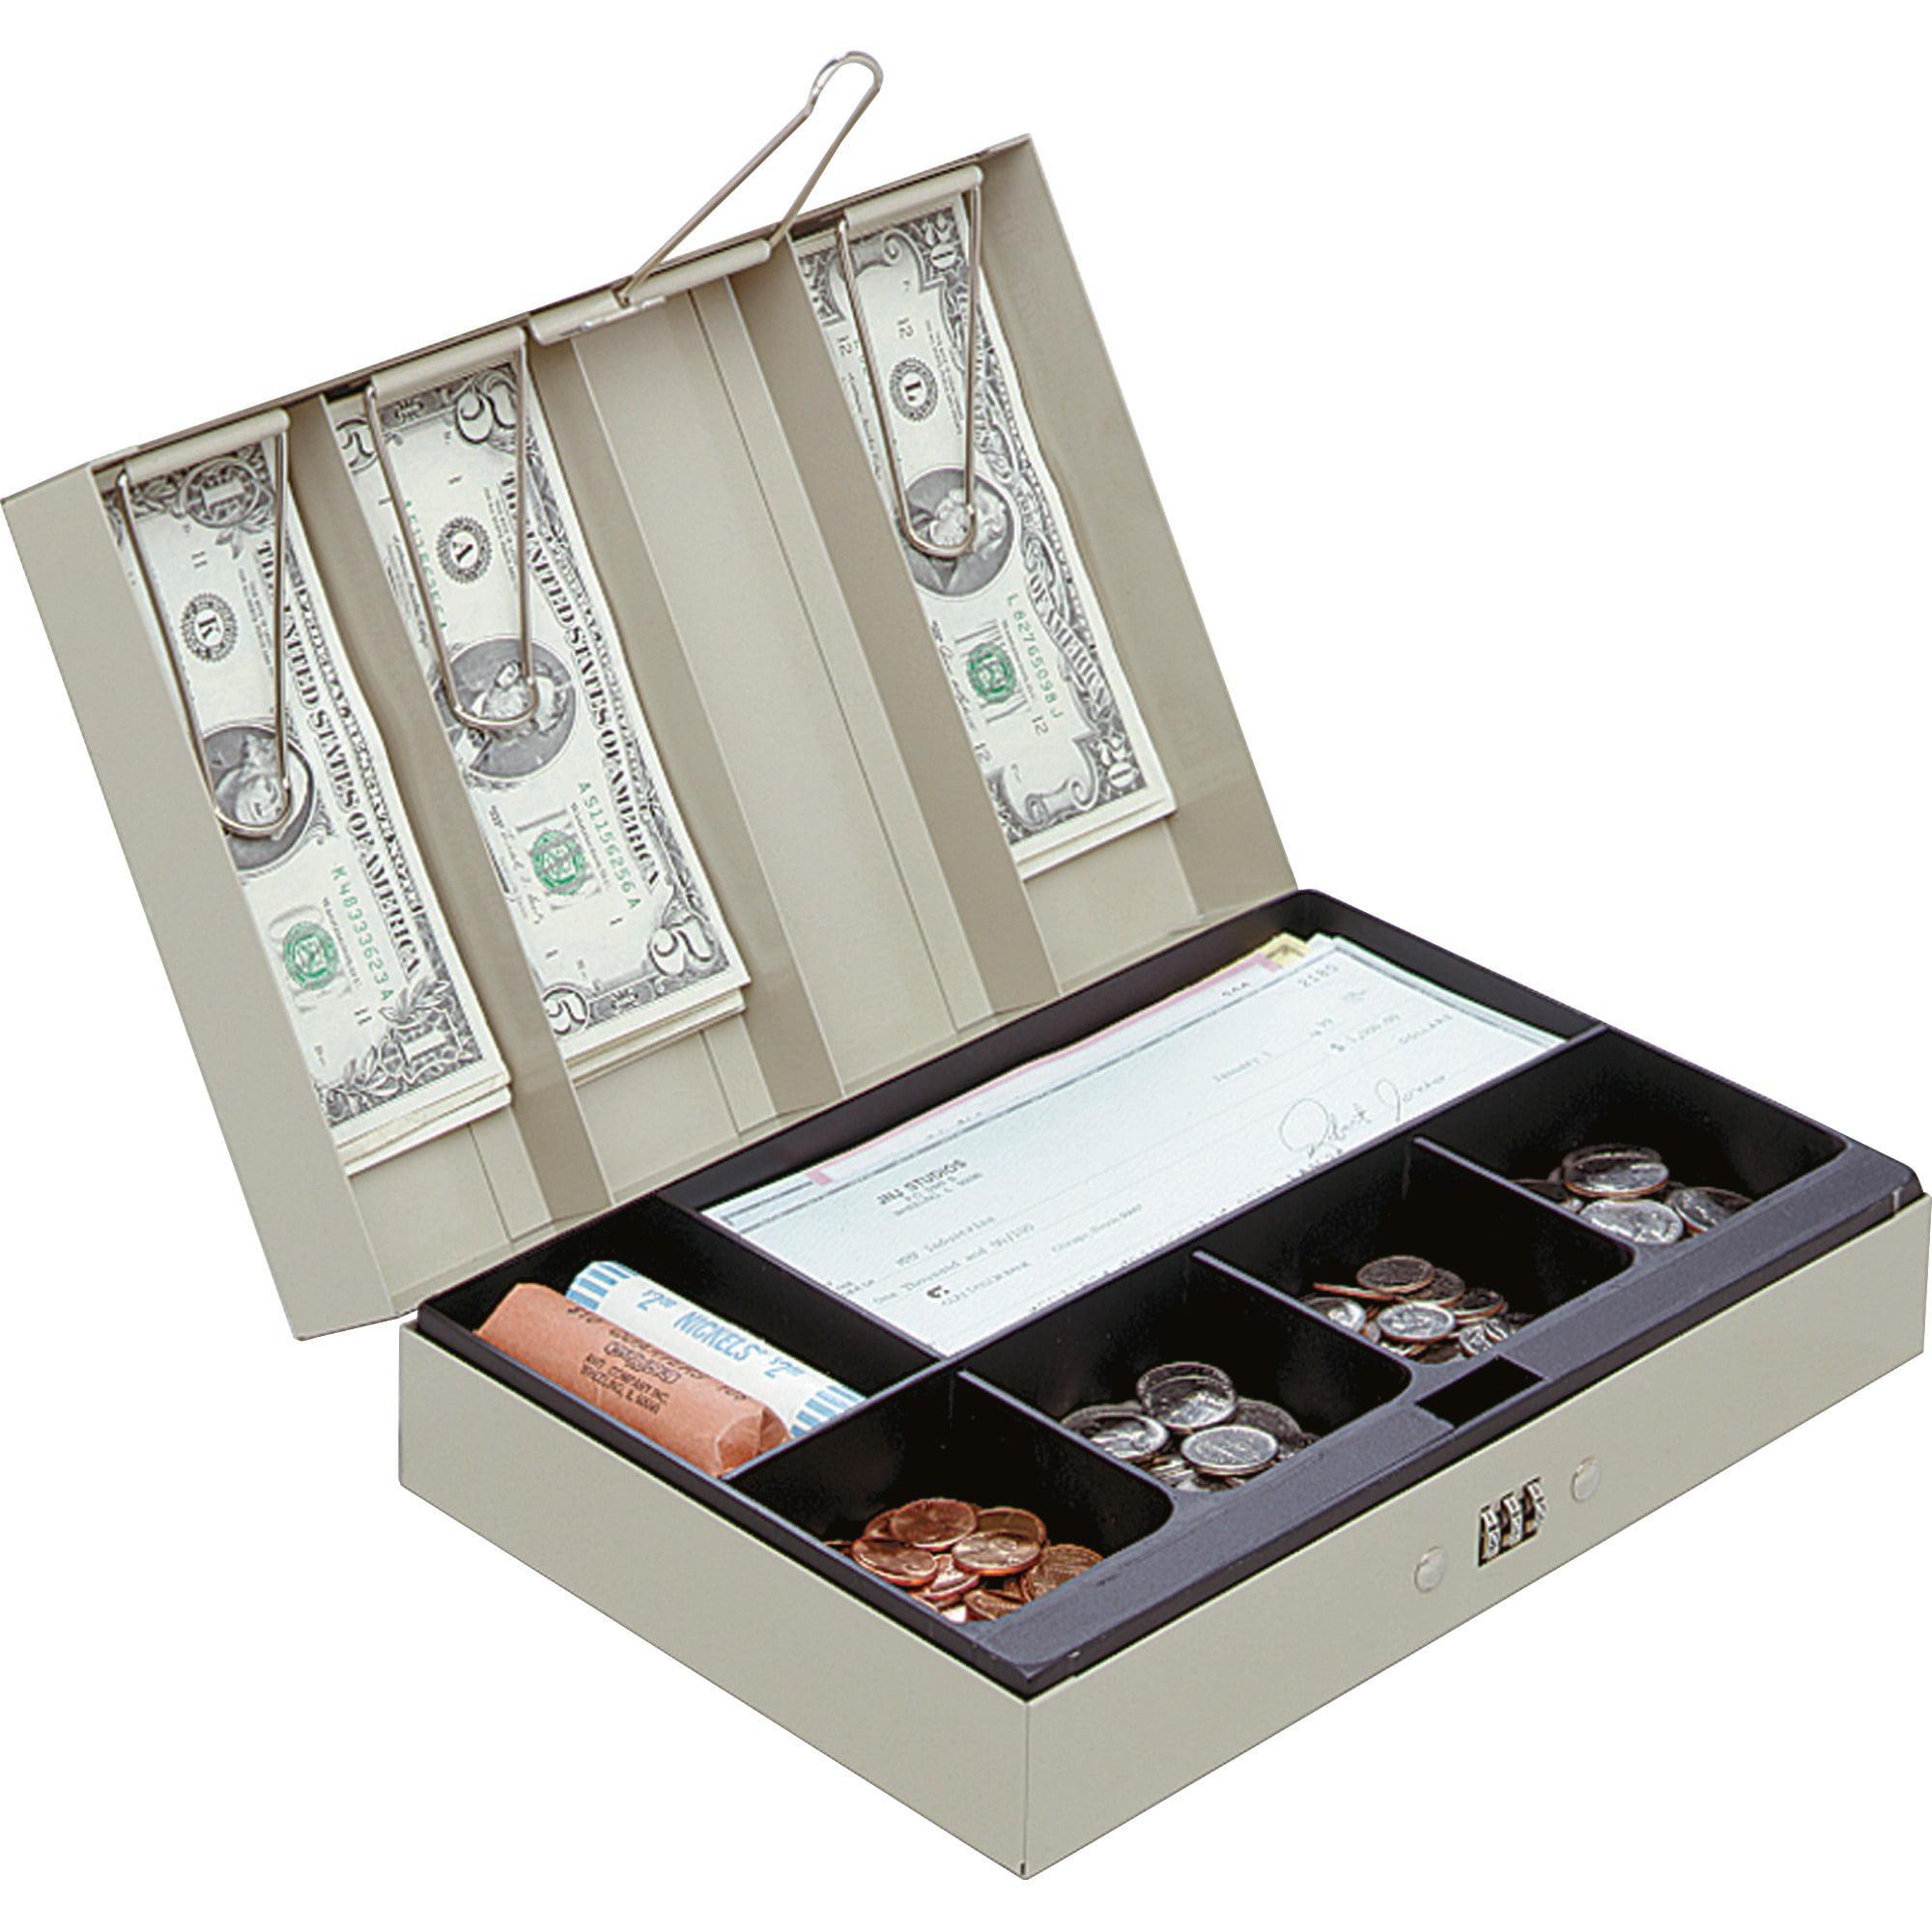 MMF, MMF221619003, Combination Lock Portable Cash Box, Sand